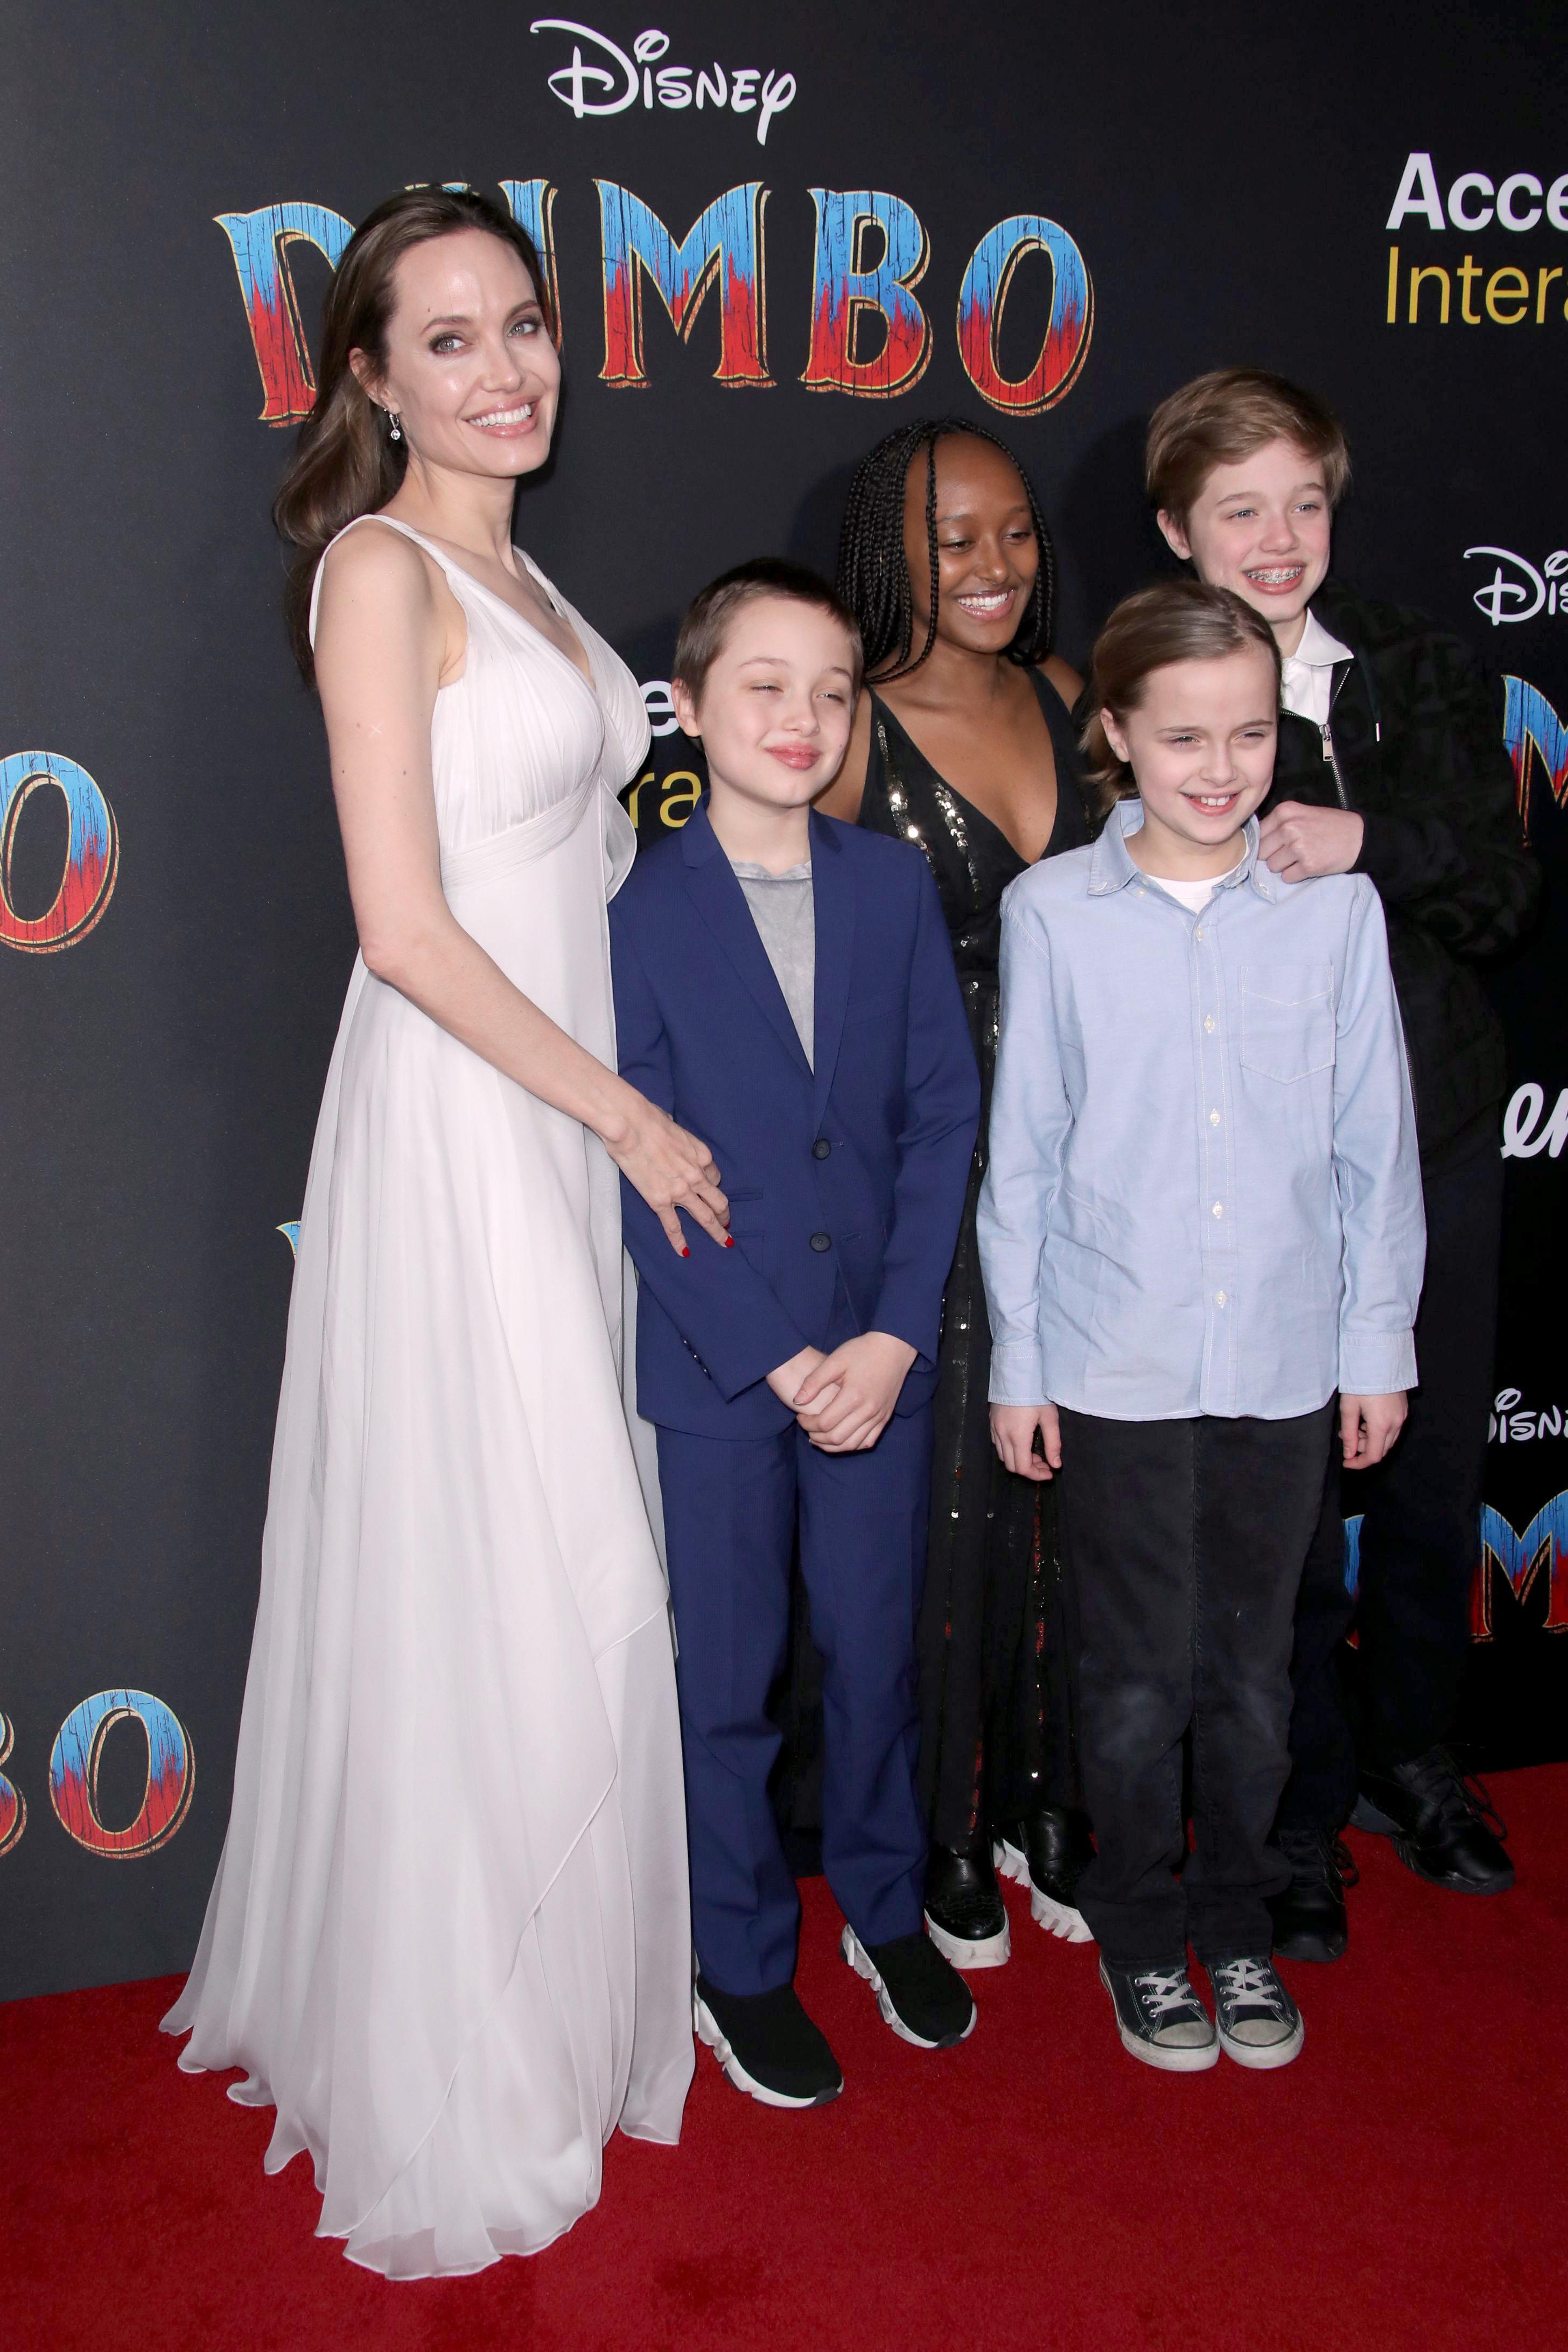 Angelina Jolie with children Shiloh Jolie-Pitt, Vivienne Jolie Pitt, Zahara Jolie Pitt and Knox Jolie Pitt'Dumbo' film premiere, Arrivals, Los Angeles, USA - 11 Mar 2019